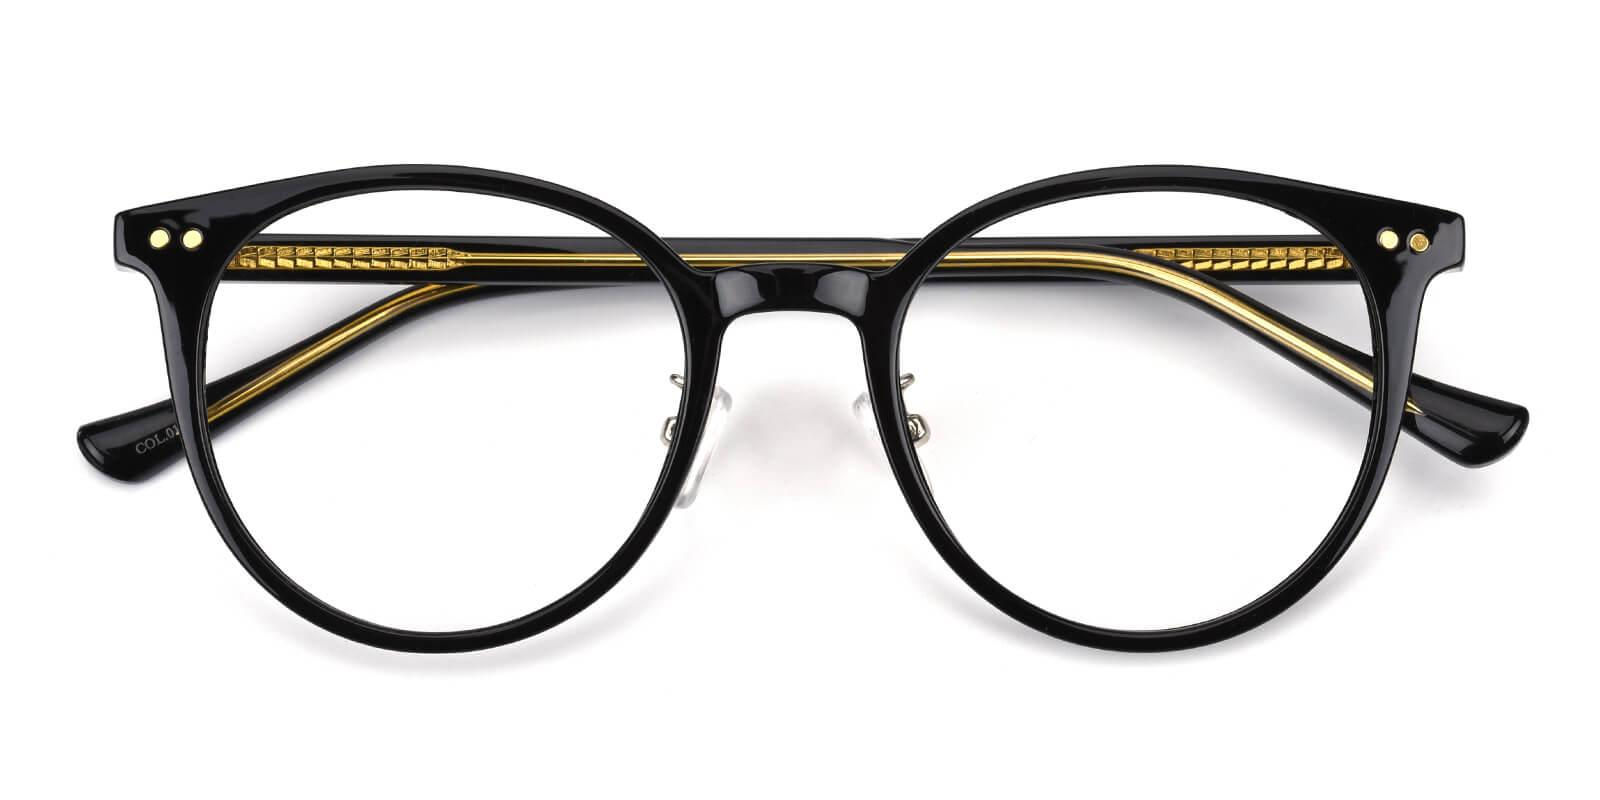 Freak-Black-Round-Acetate-Eyeglasses-detail